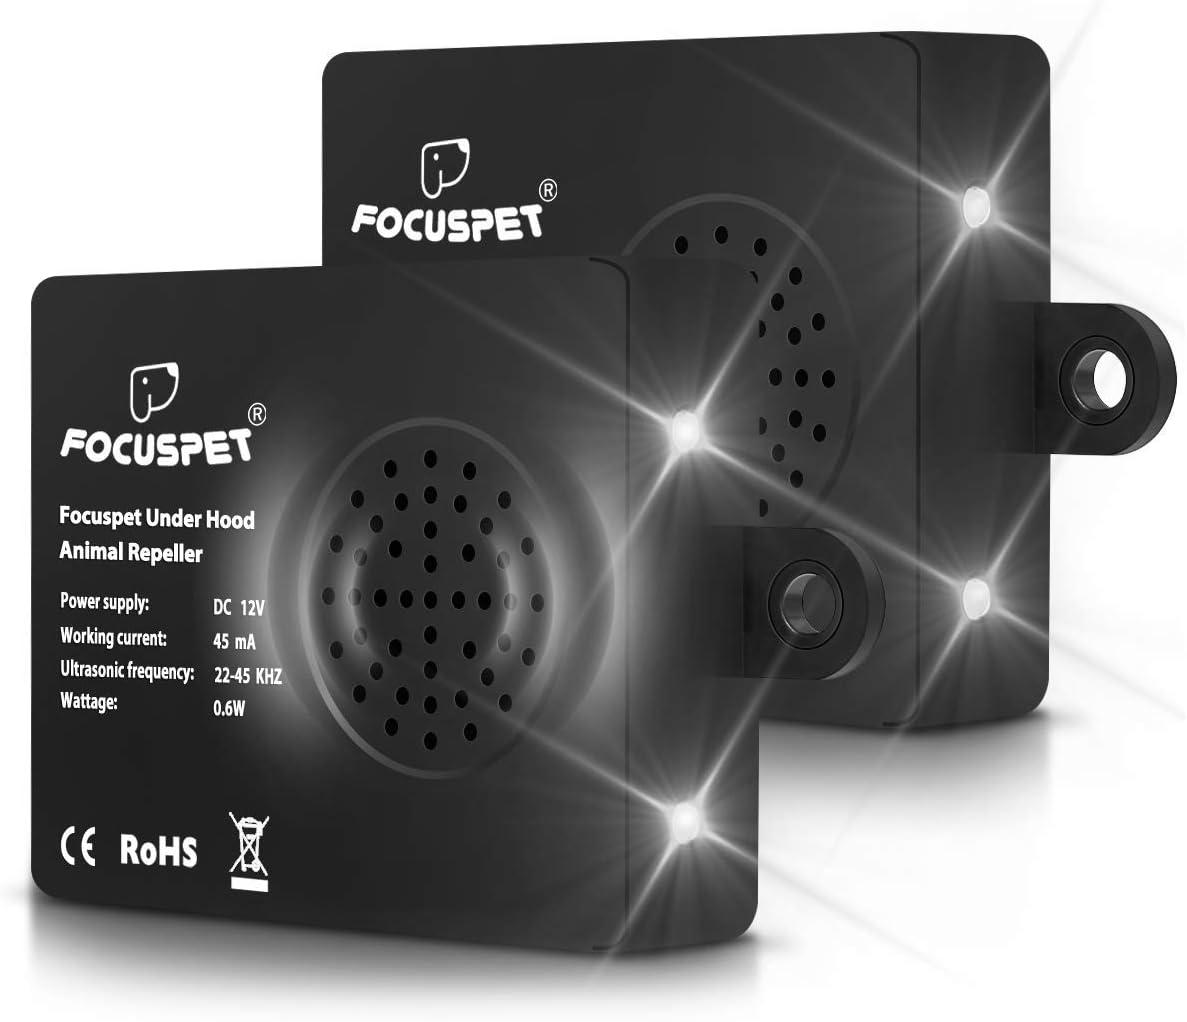 Focuspet Repelente Ultrasonico de Ratas Coche, [2 Piezas] 12V Bateria Cargada, Ahuyentador de Roedores Control de Comadreja, Mole, ratone para Casa 22-45KHZ